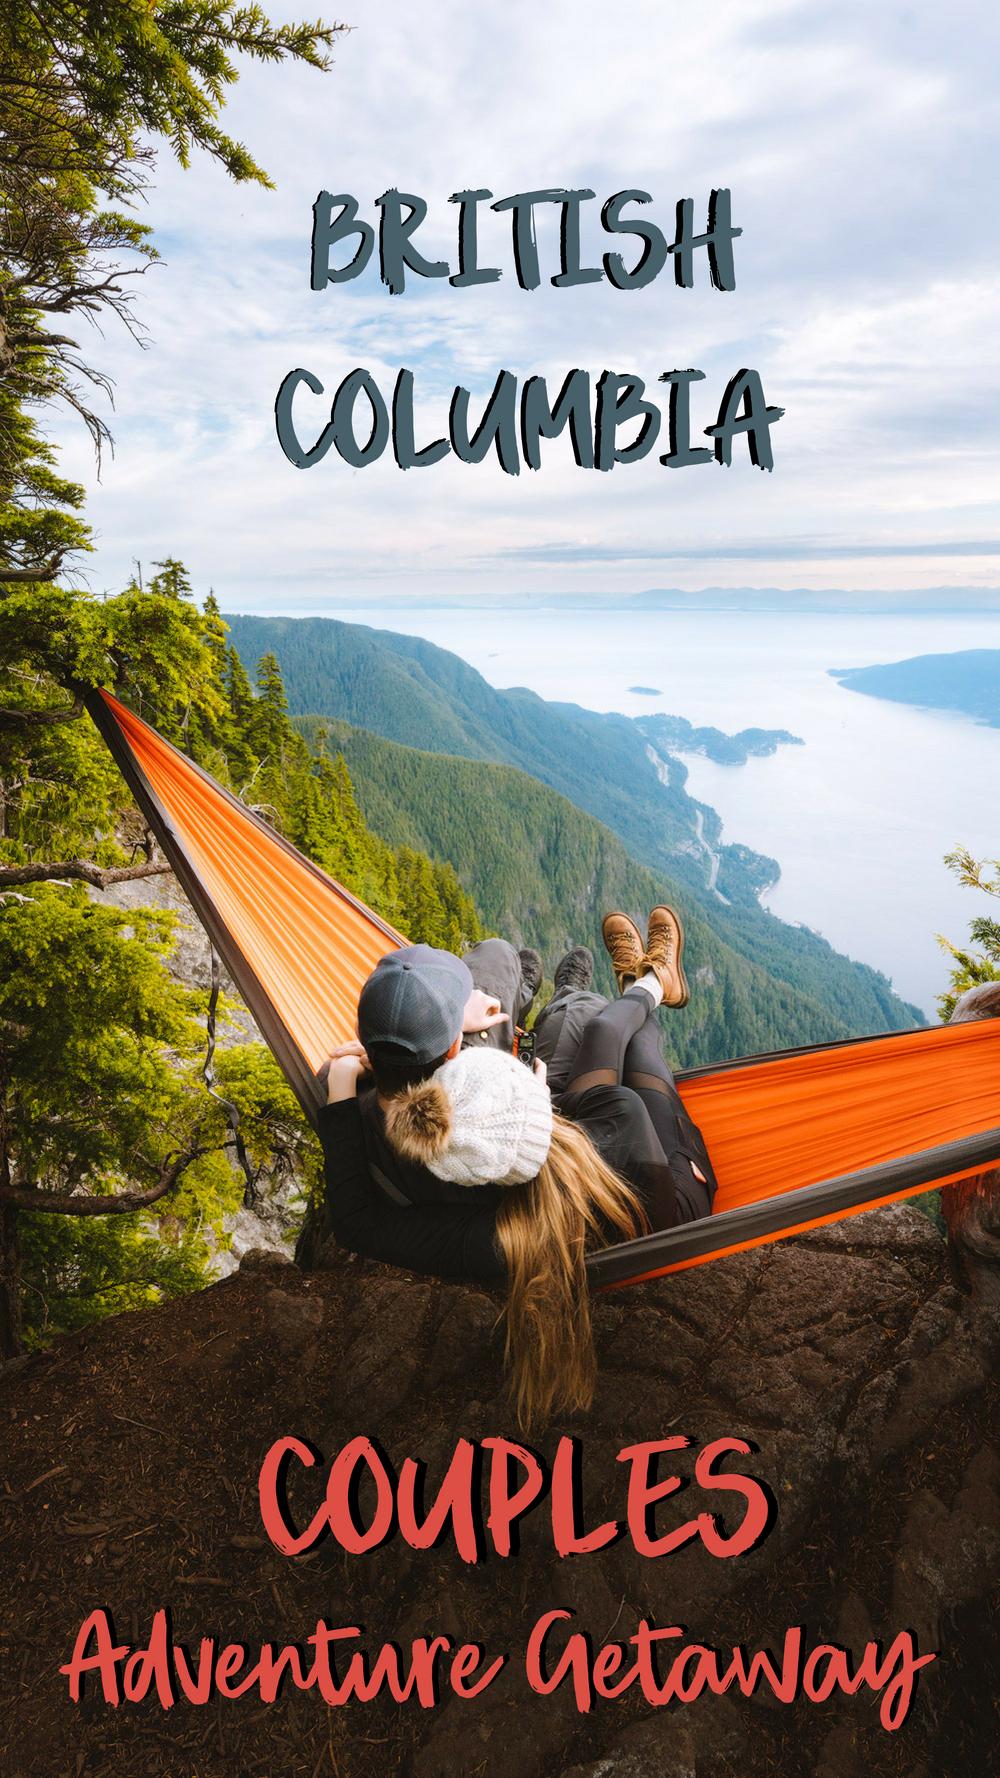 Couples Adventure Getaway to British Columbia PIN (1)